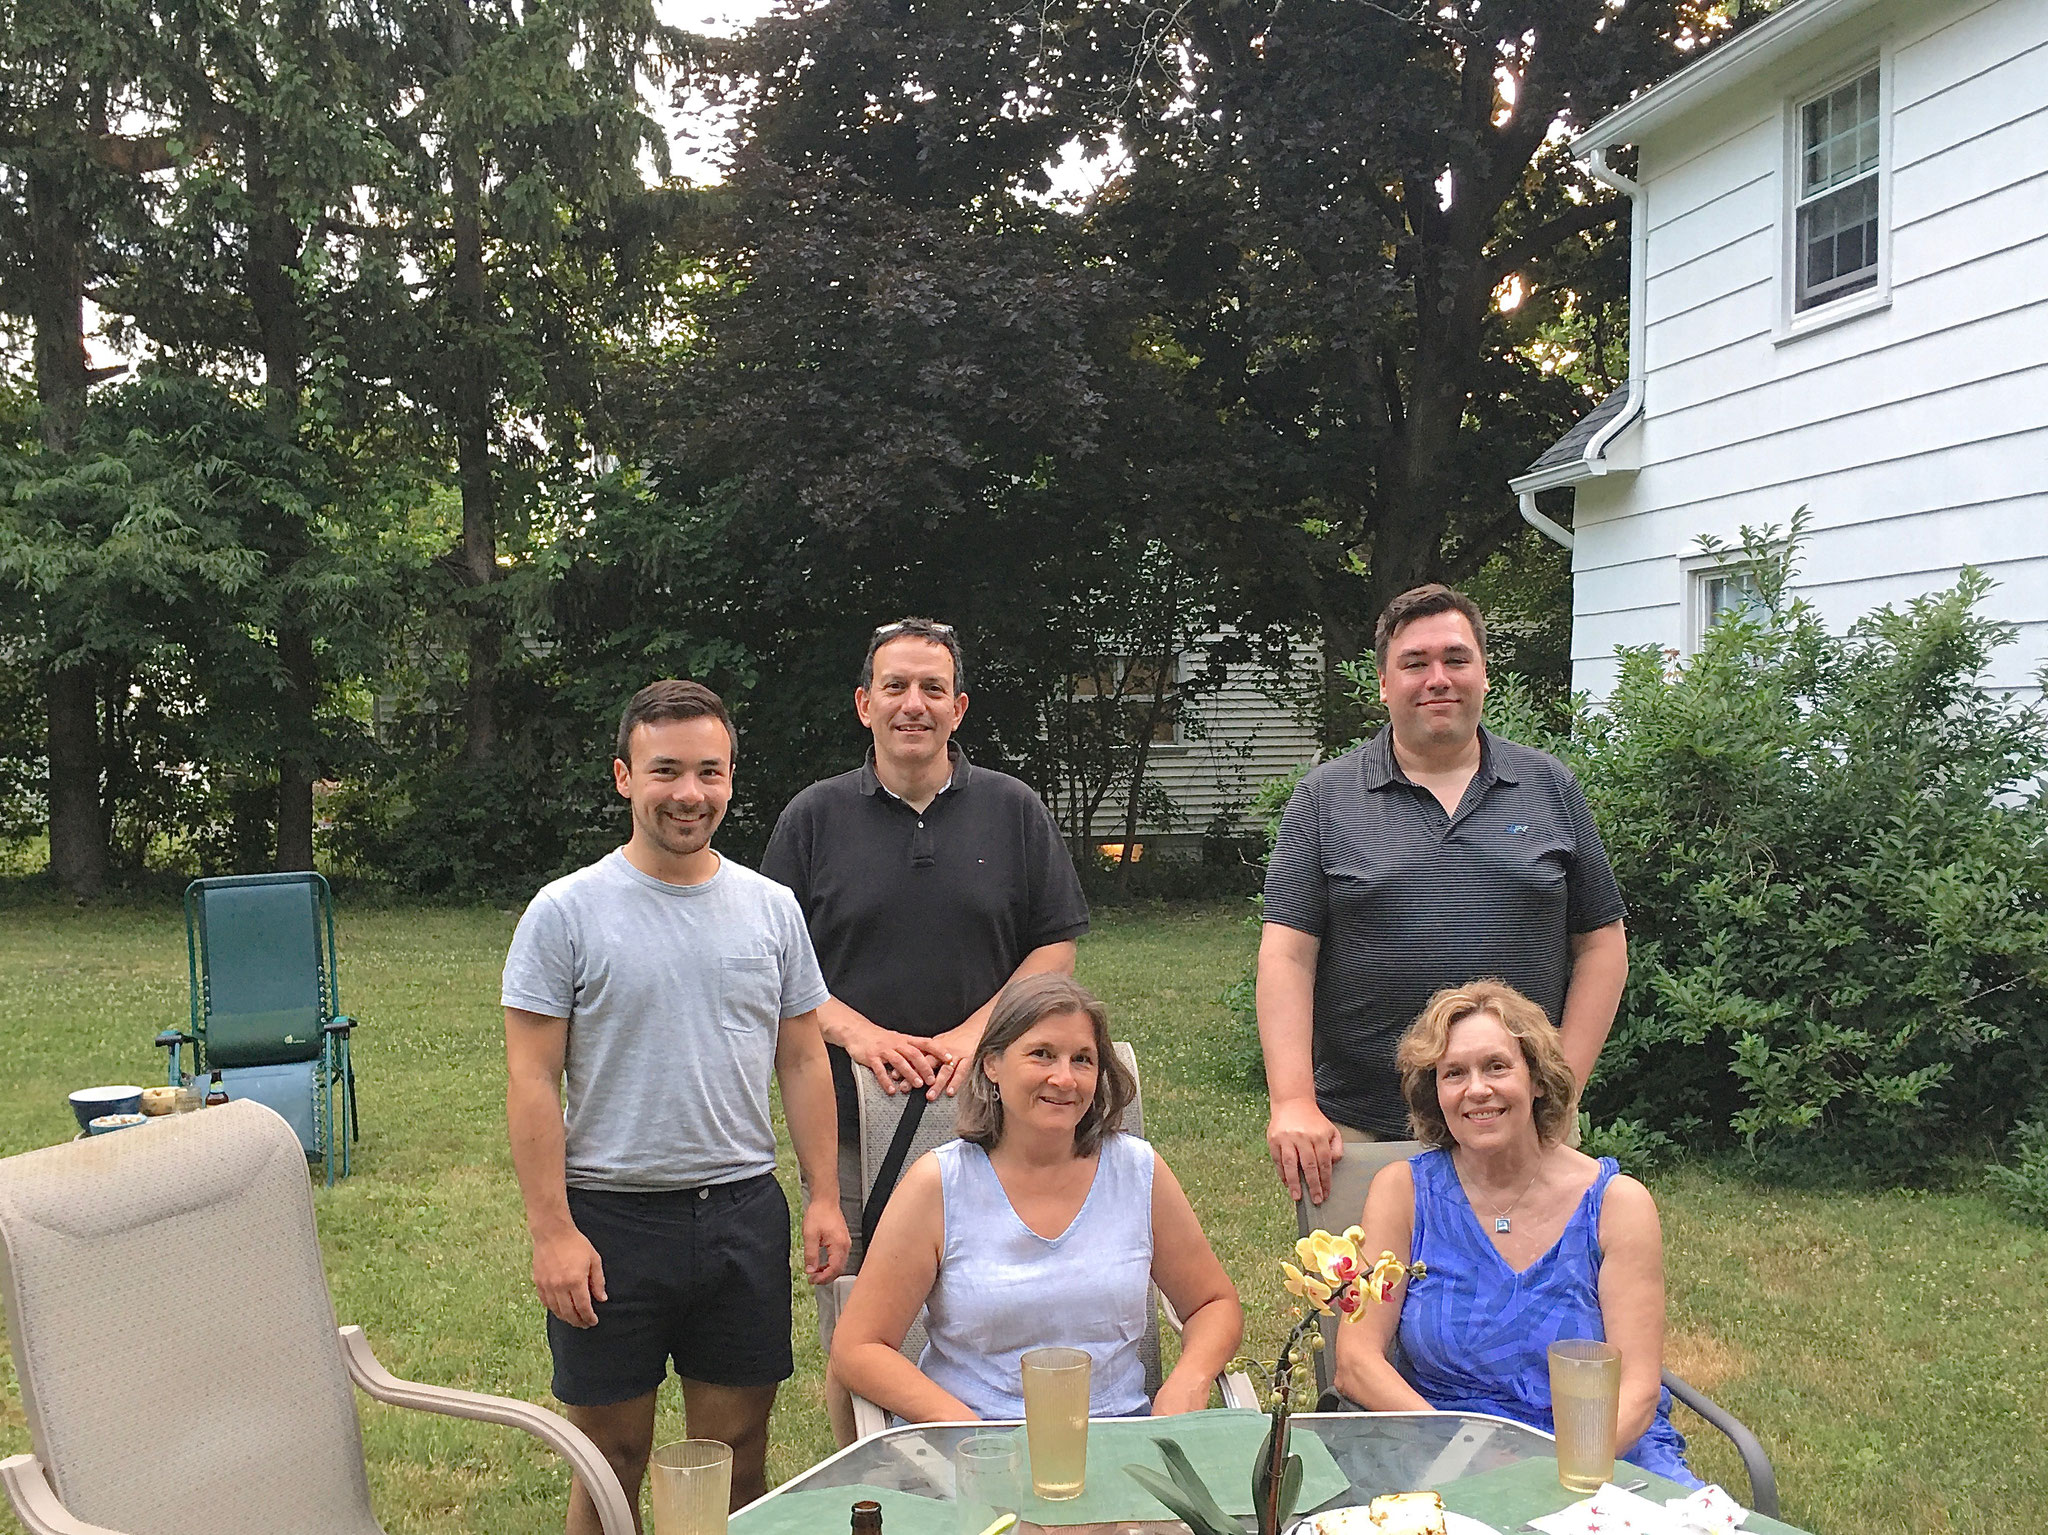 Trevan, Nick, Cyndi, Greg, Lorraine at the home of El and Al, Syracuse, NY 7-4-2020